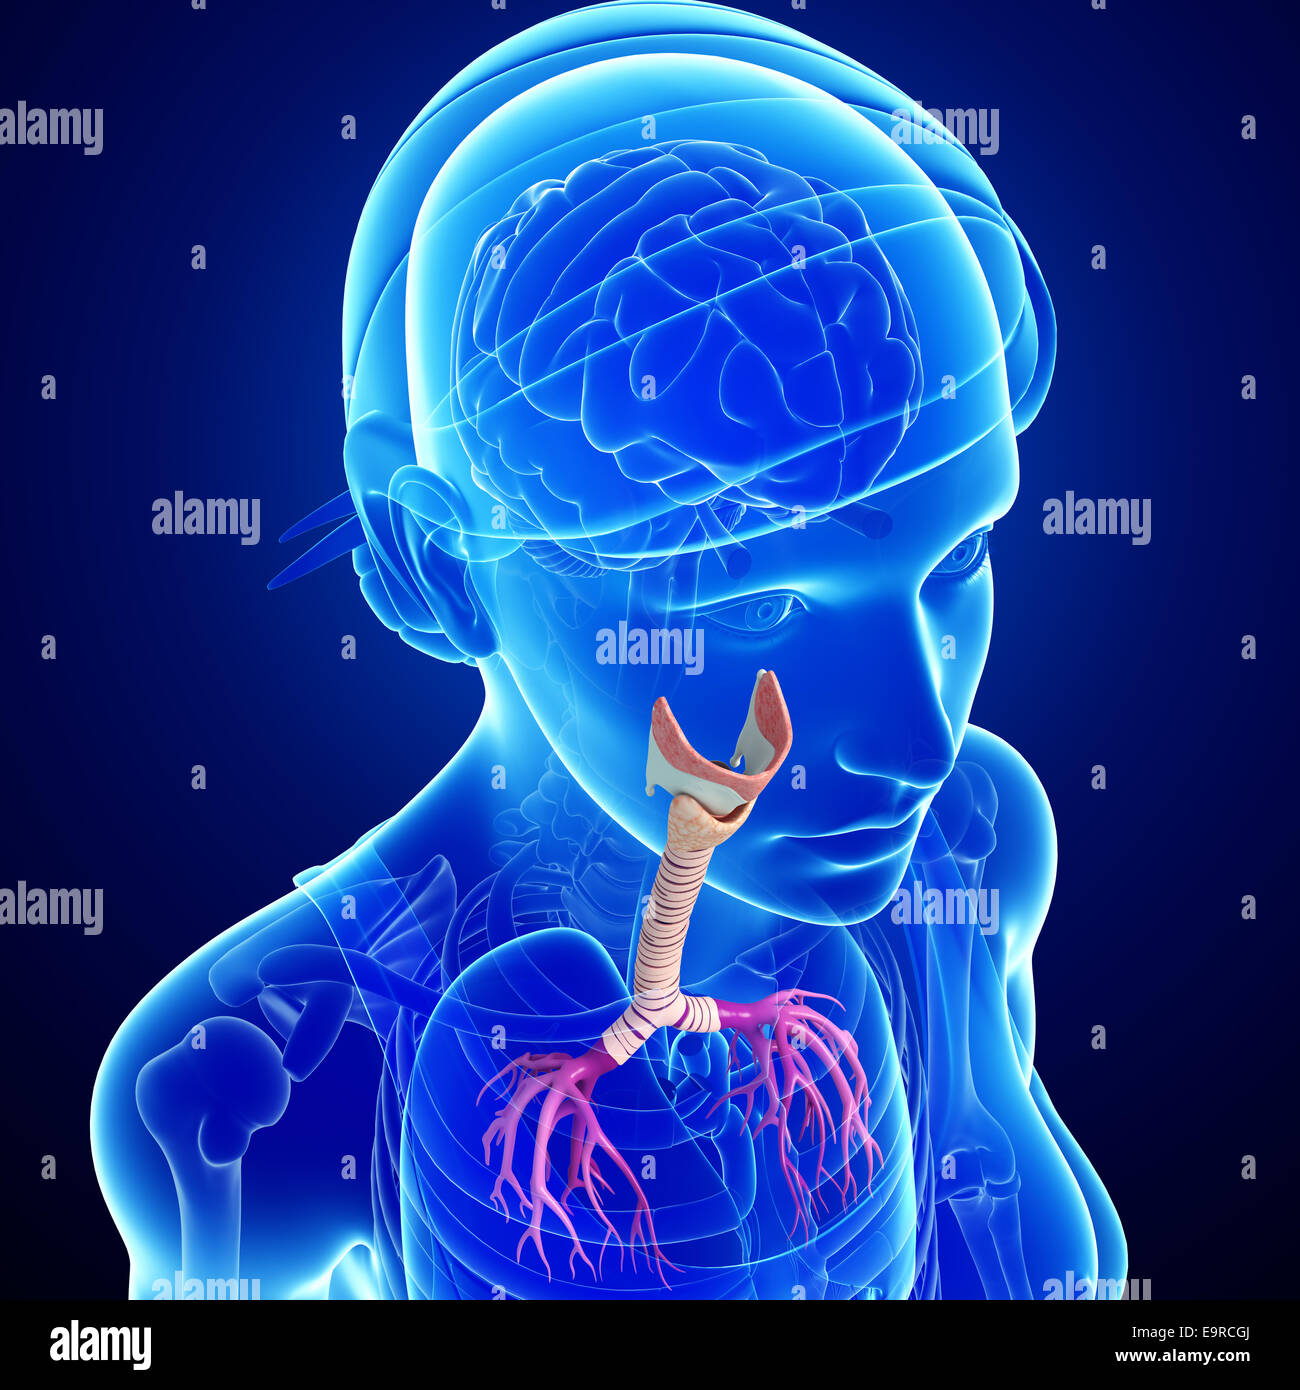 Tracheal Cartilage Imágenes De Stock & Tracheal Cartilage Fotos De ...